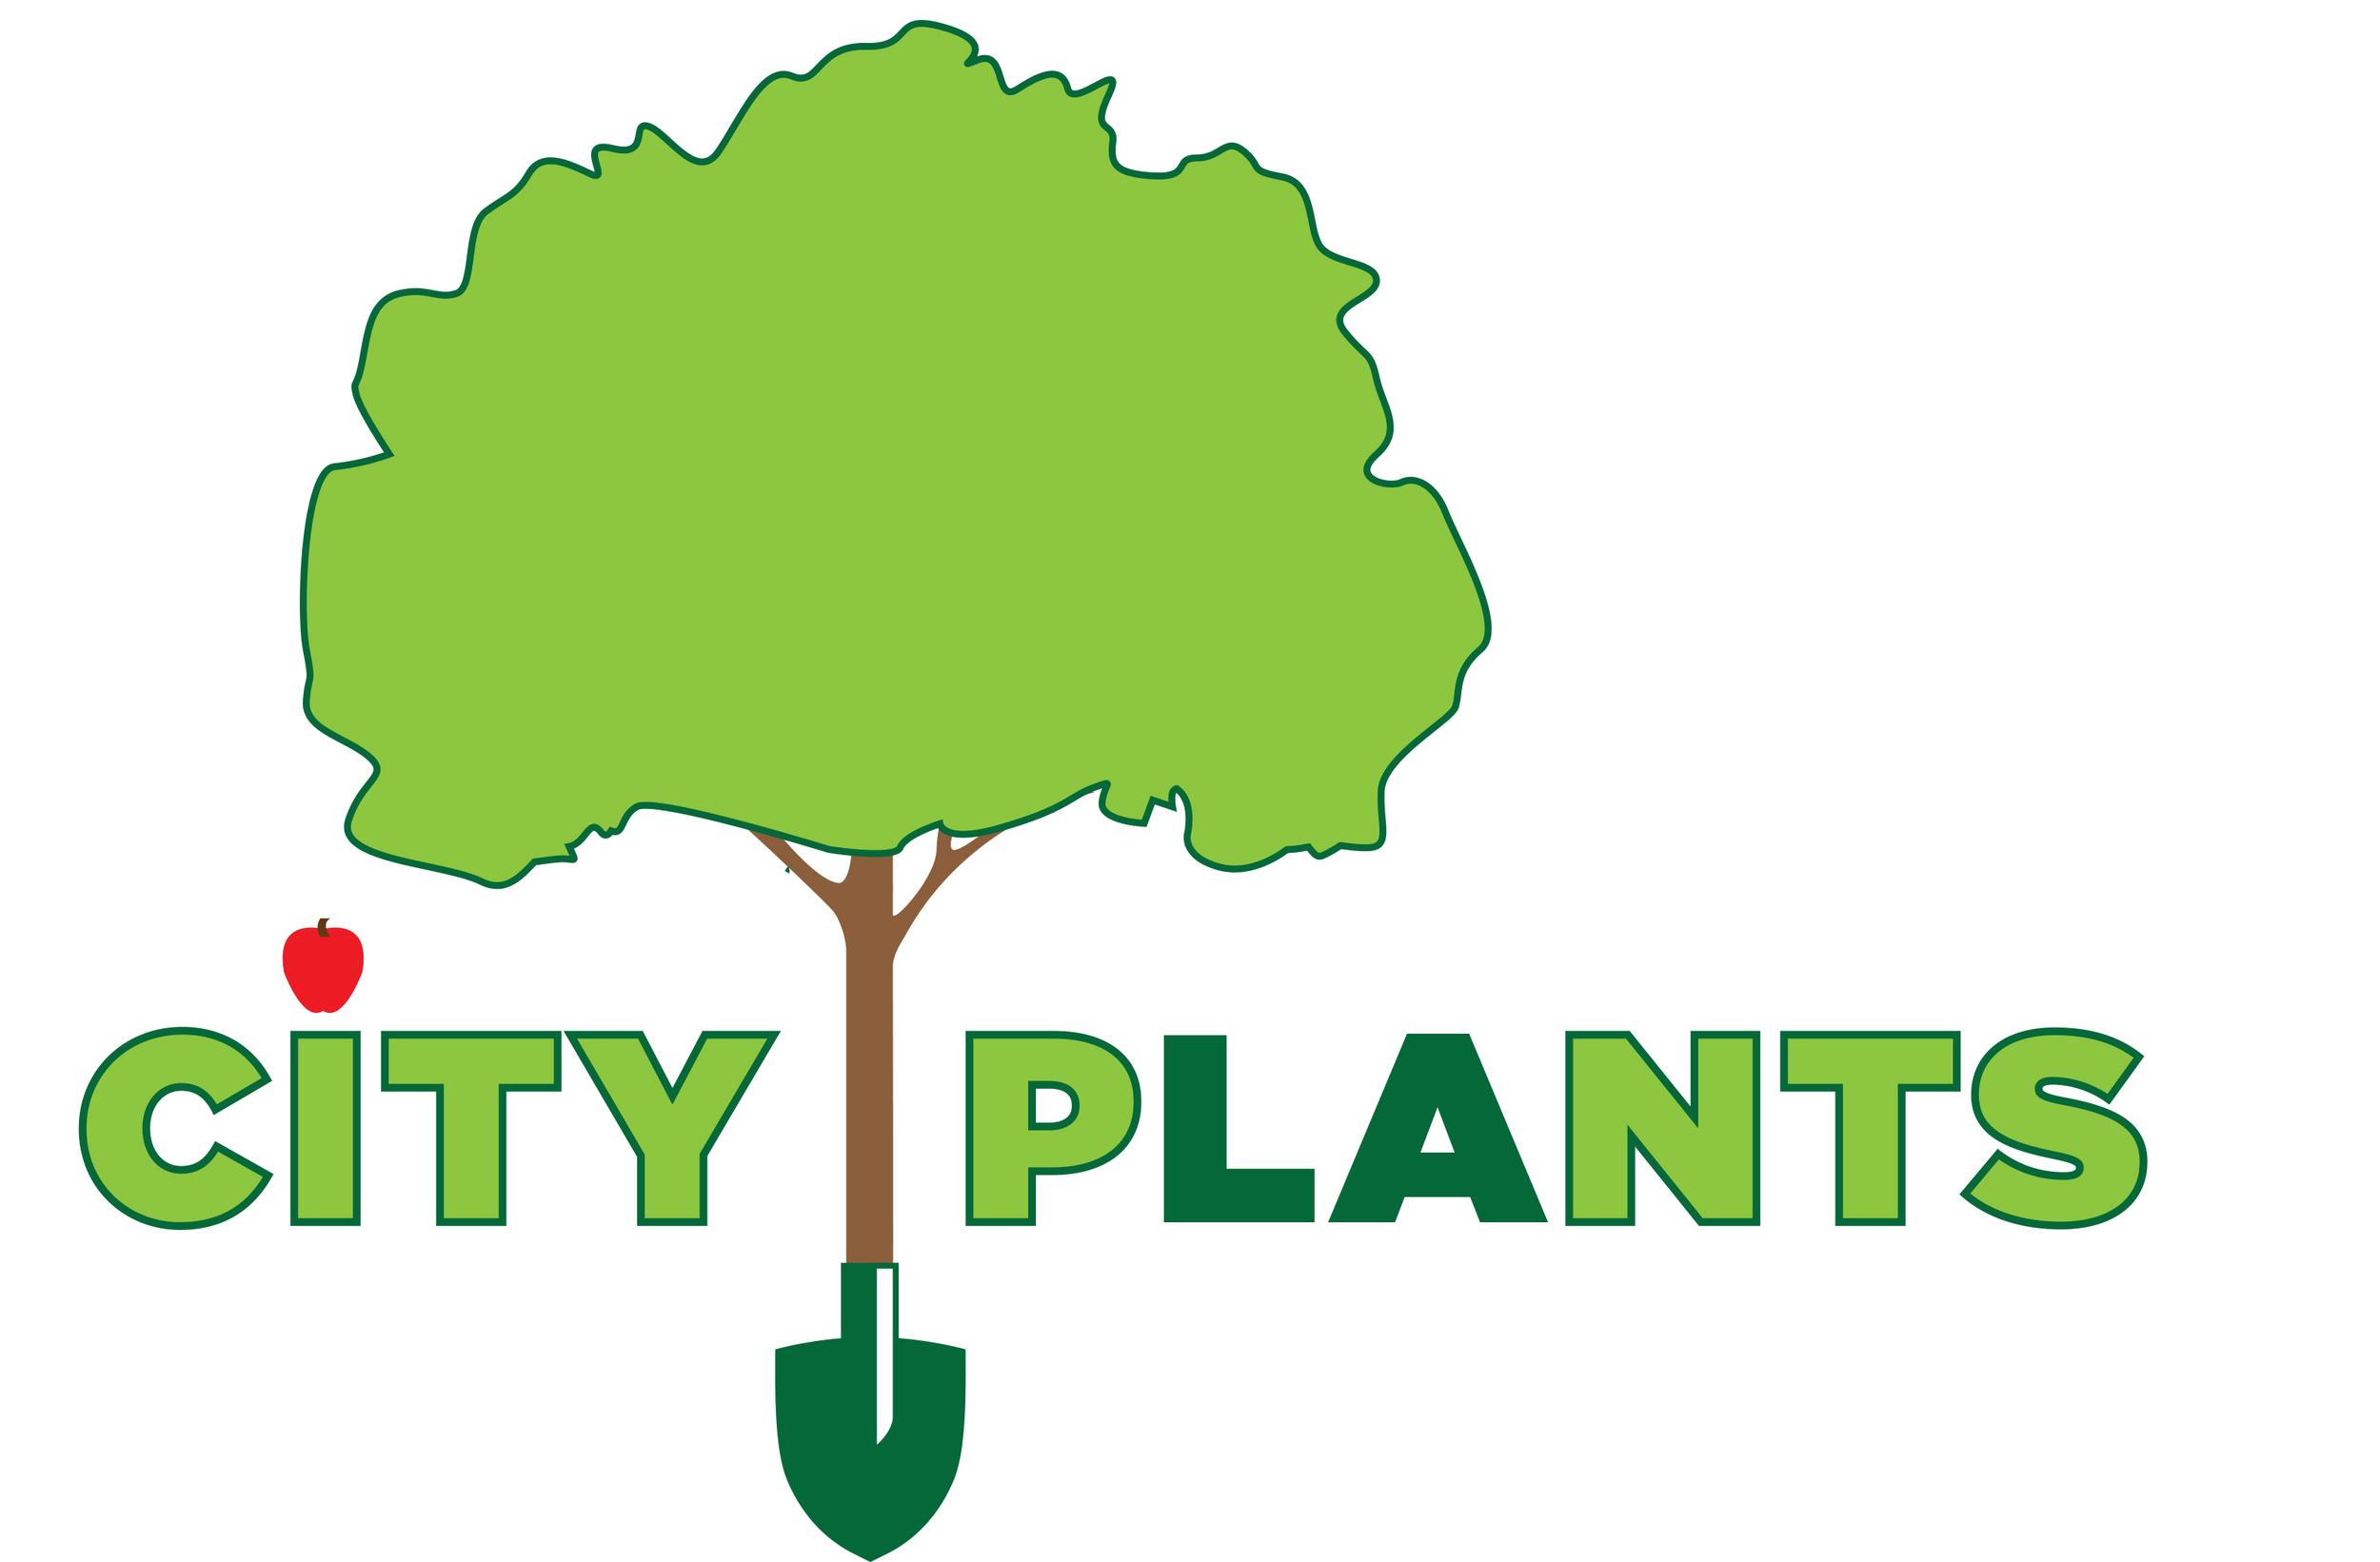 City_Plants_logo.jpg